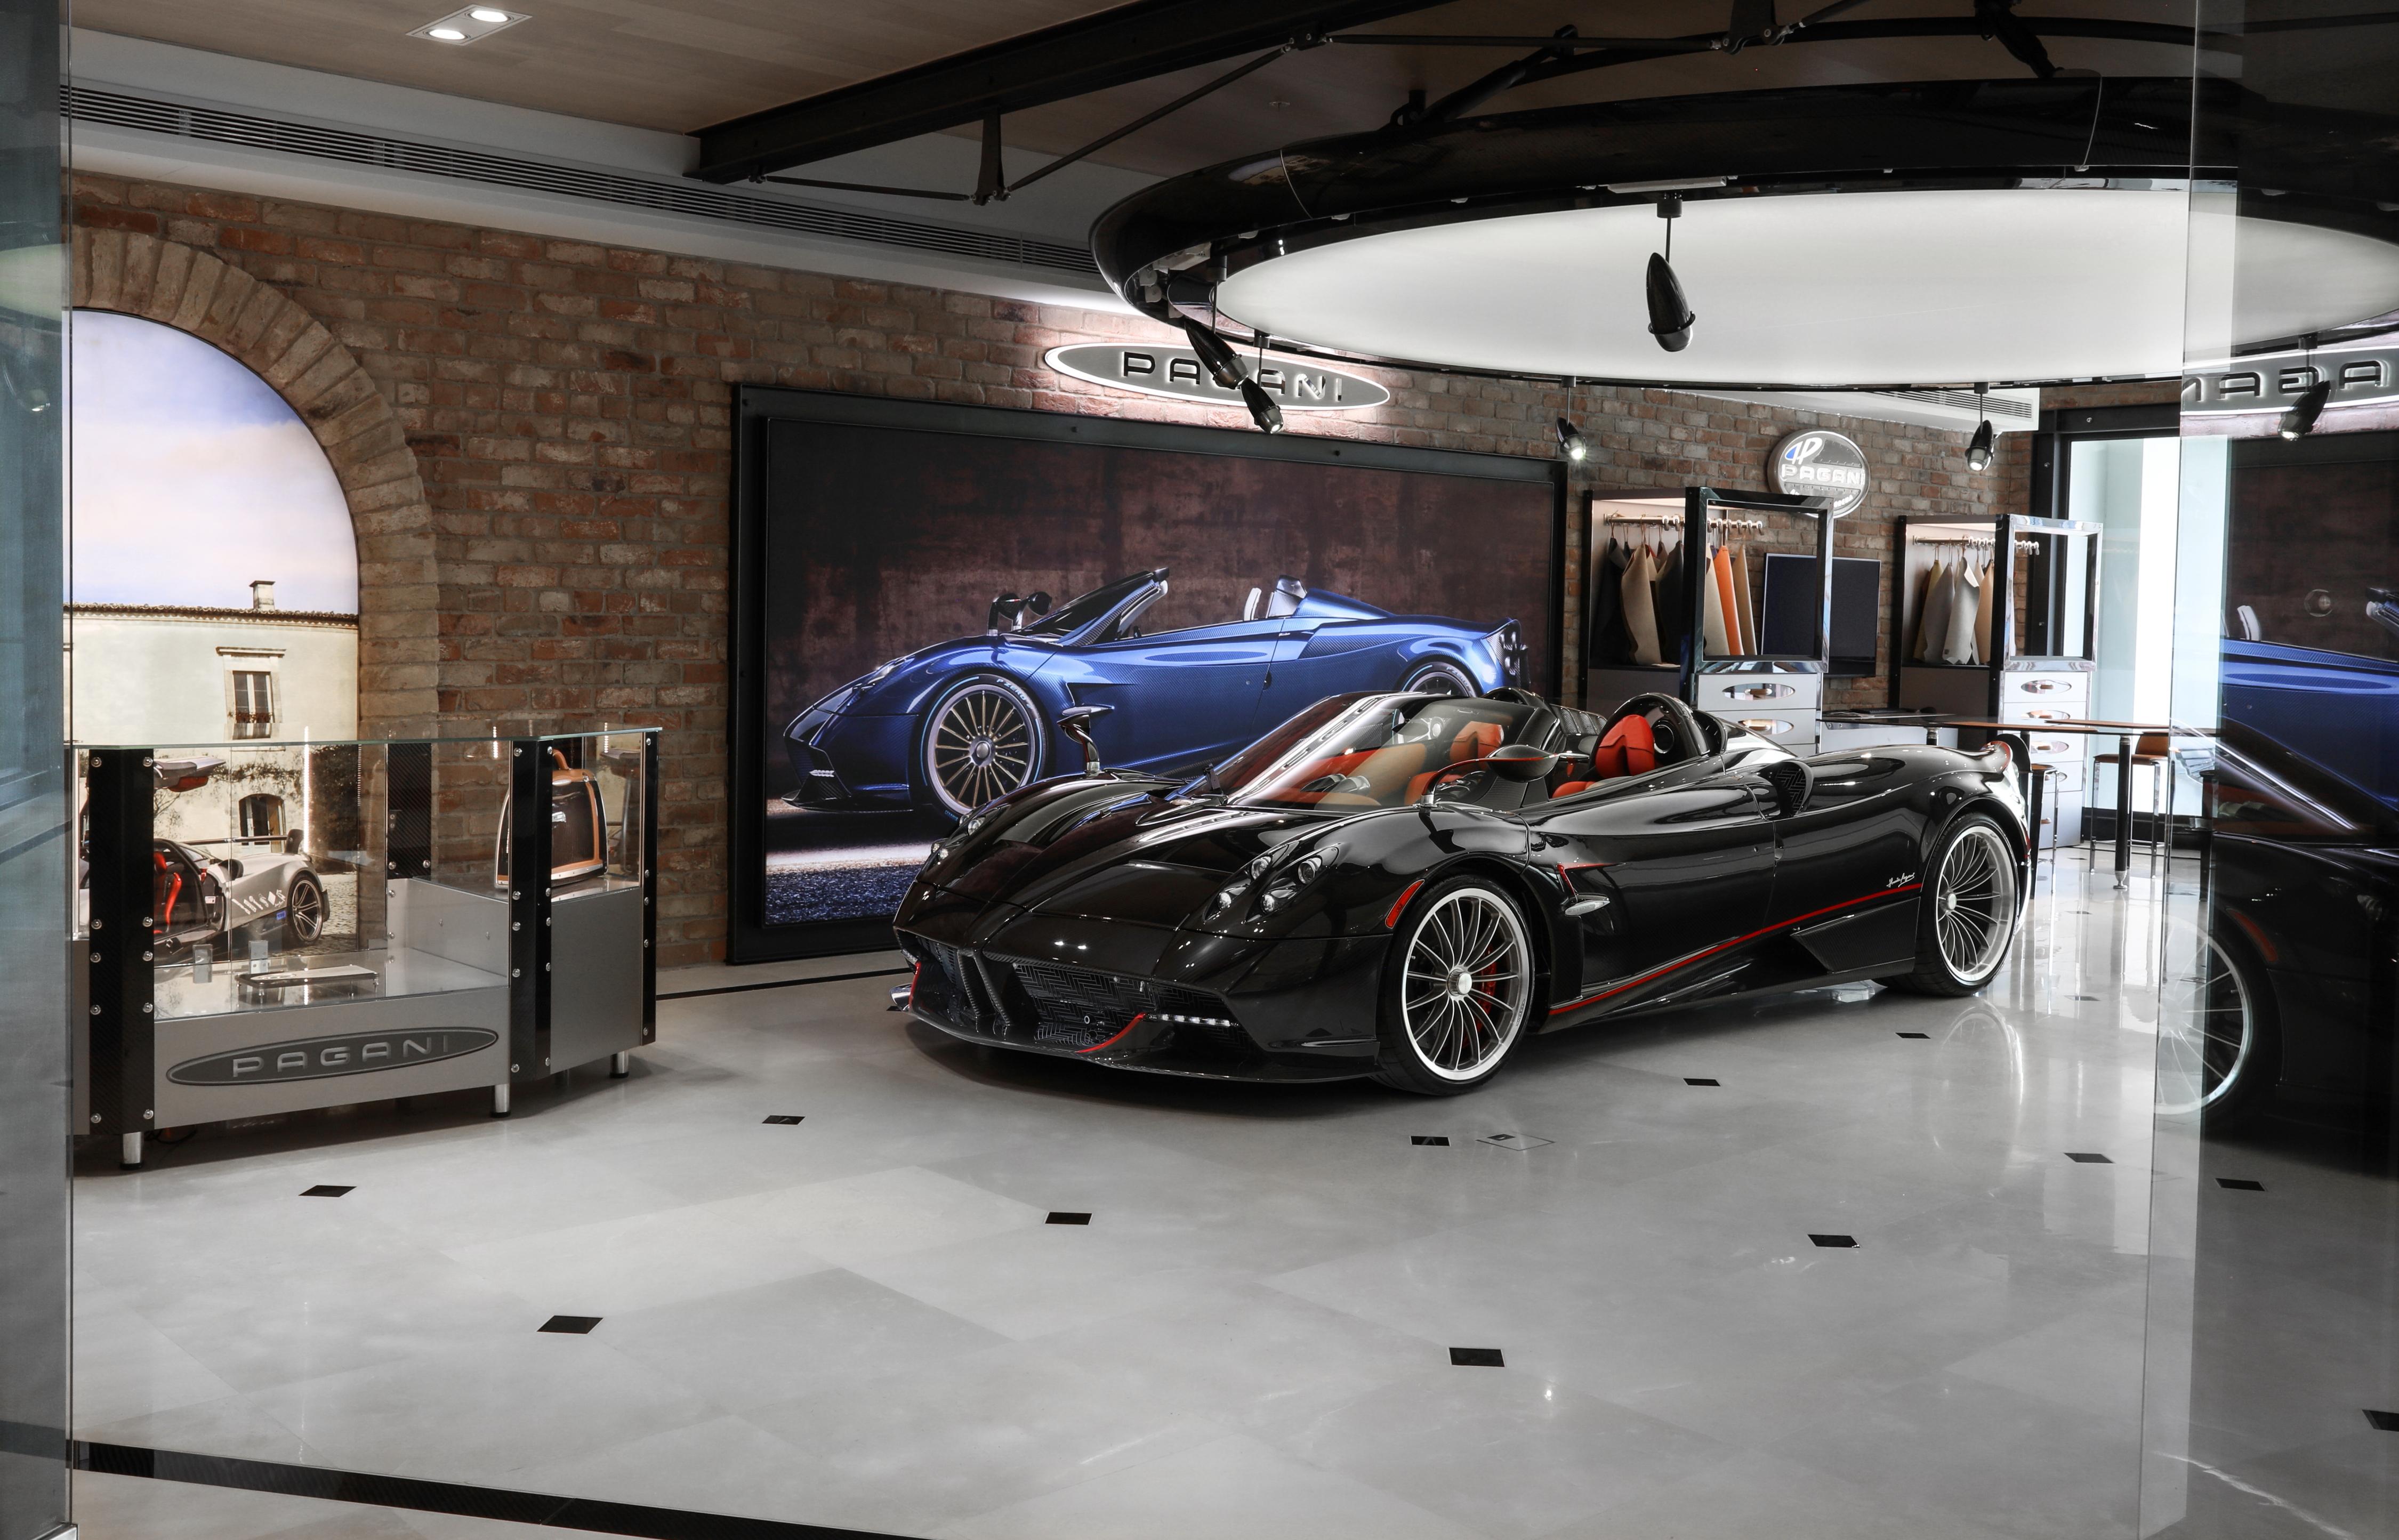 Australia's most expensive car